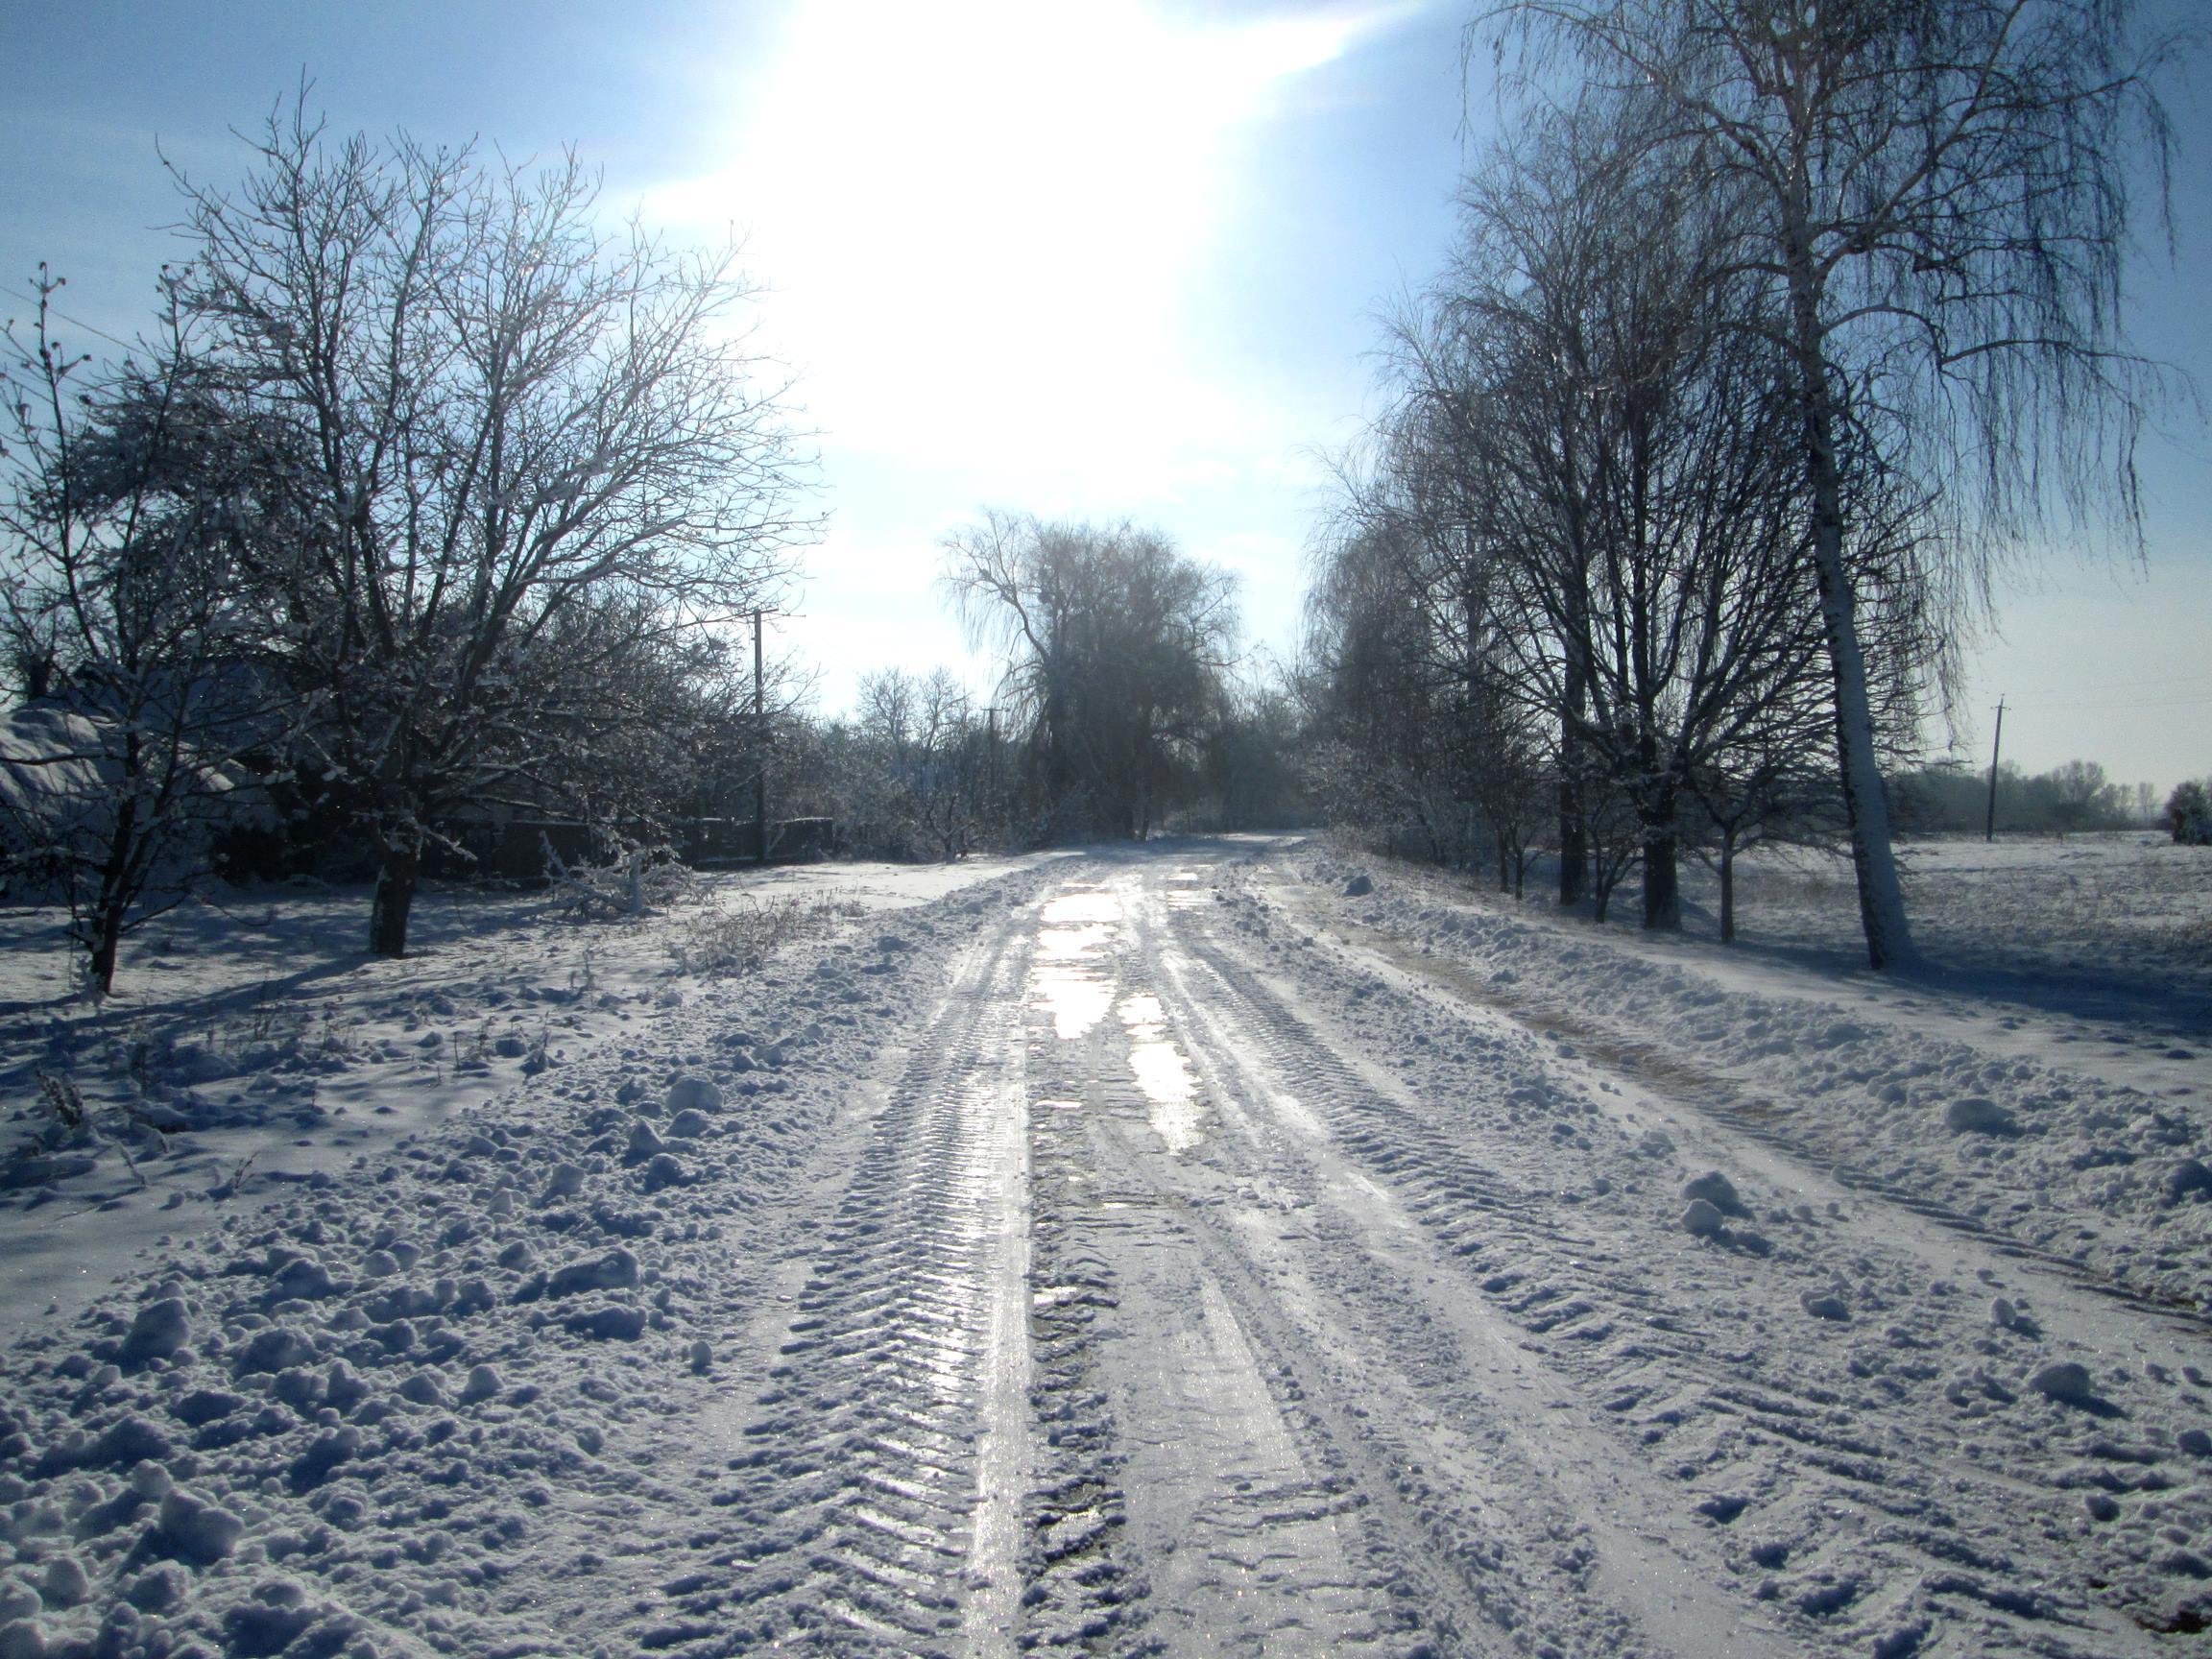 Winter in the village photo